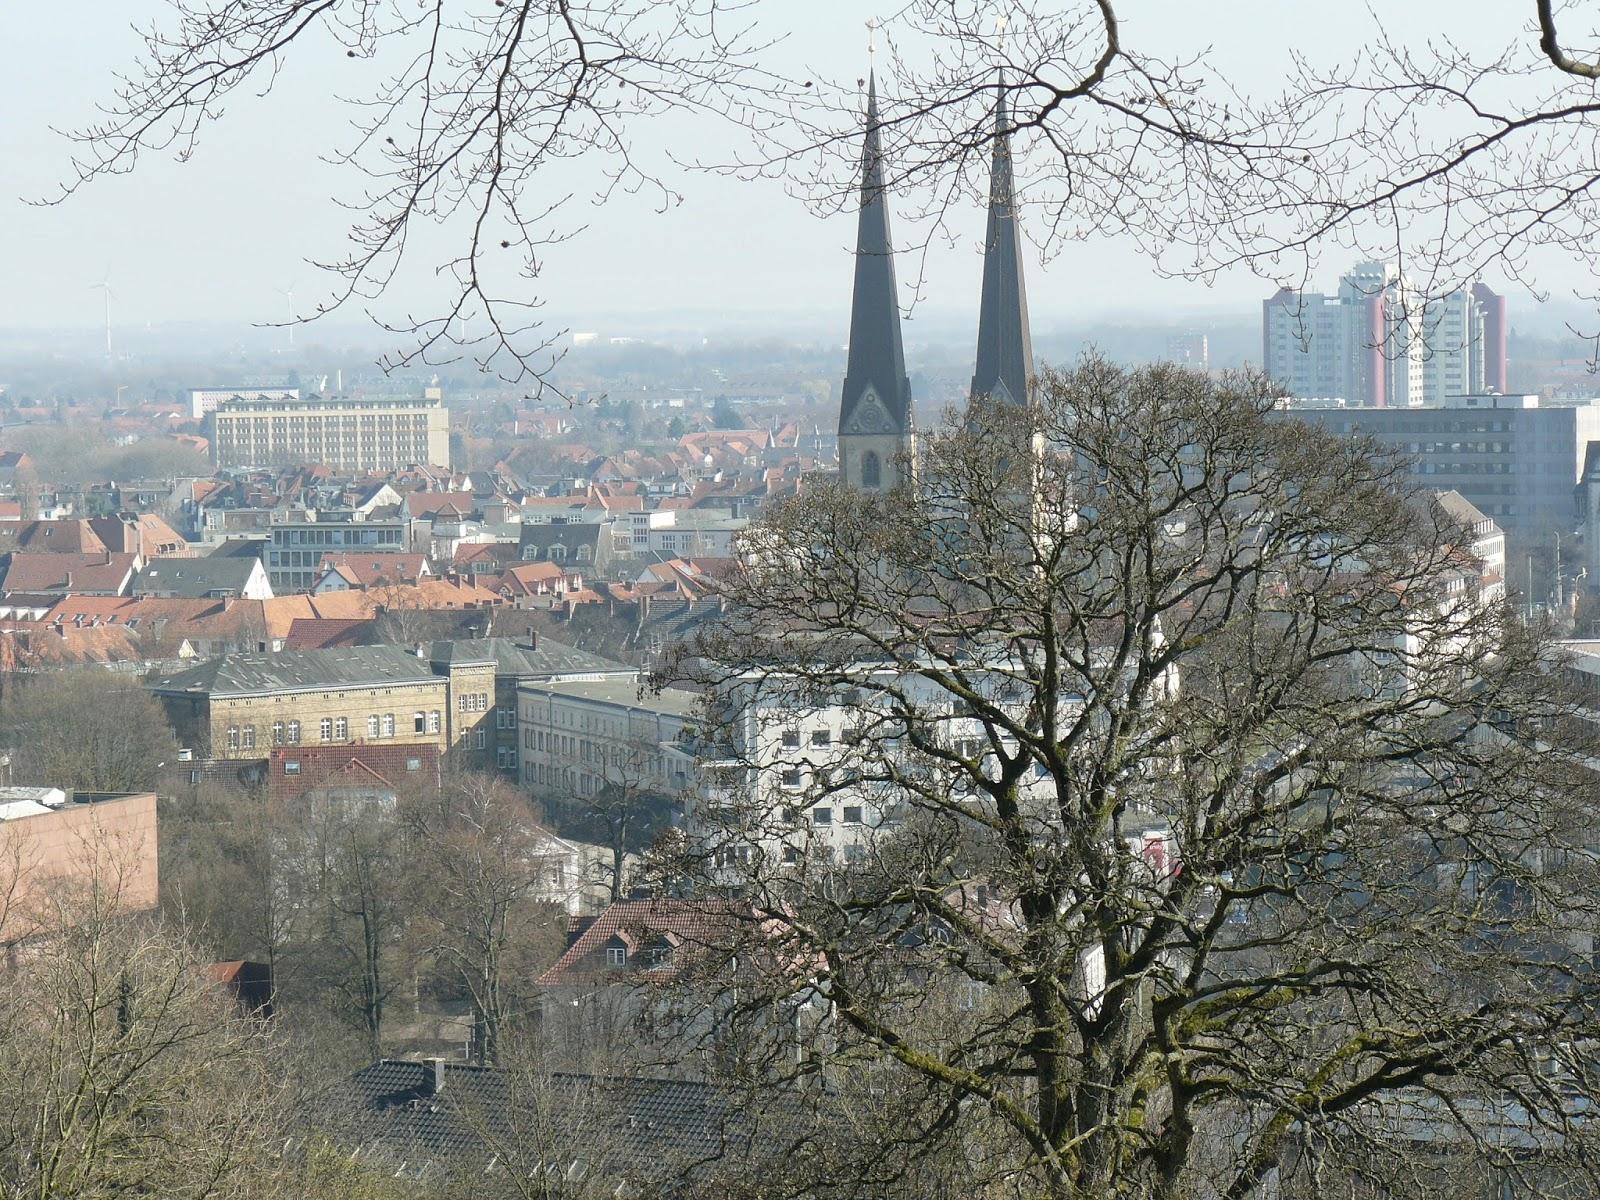 Bielefeld vom Johannisberg aus